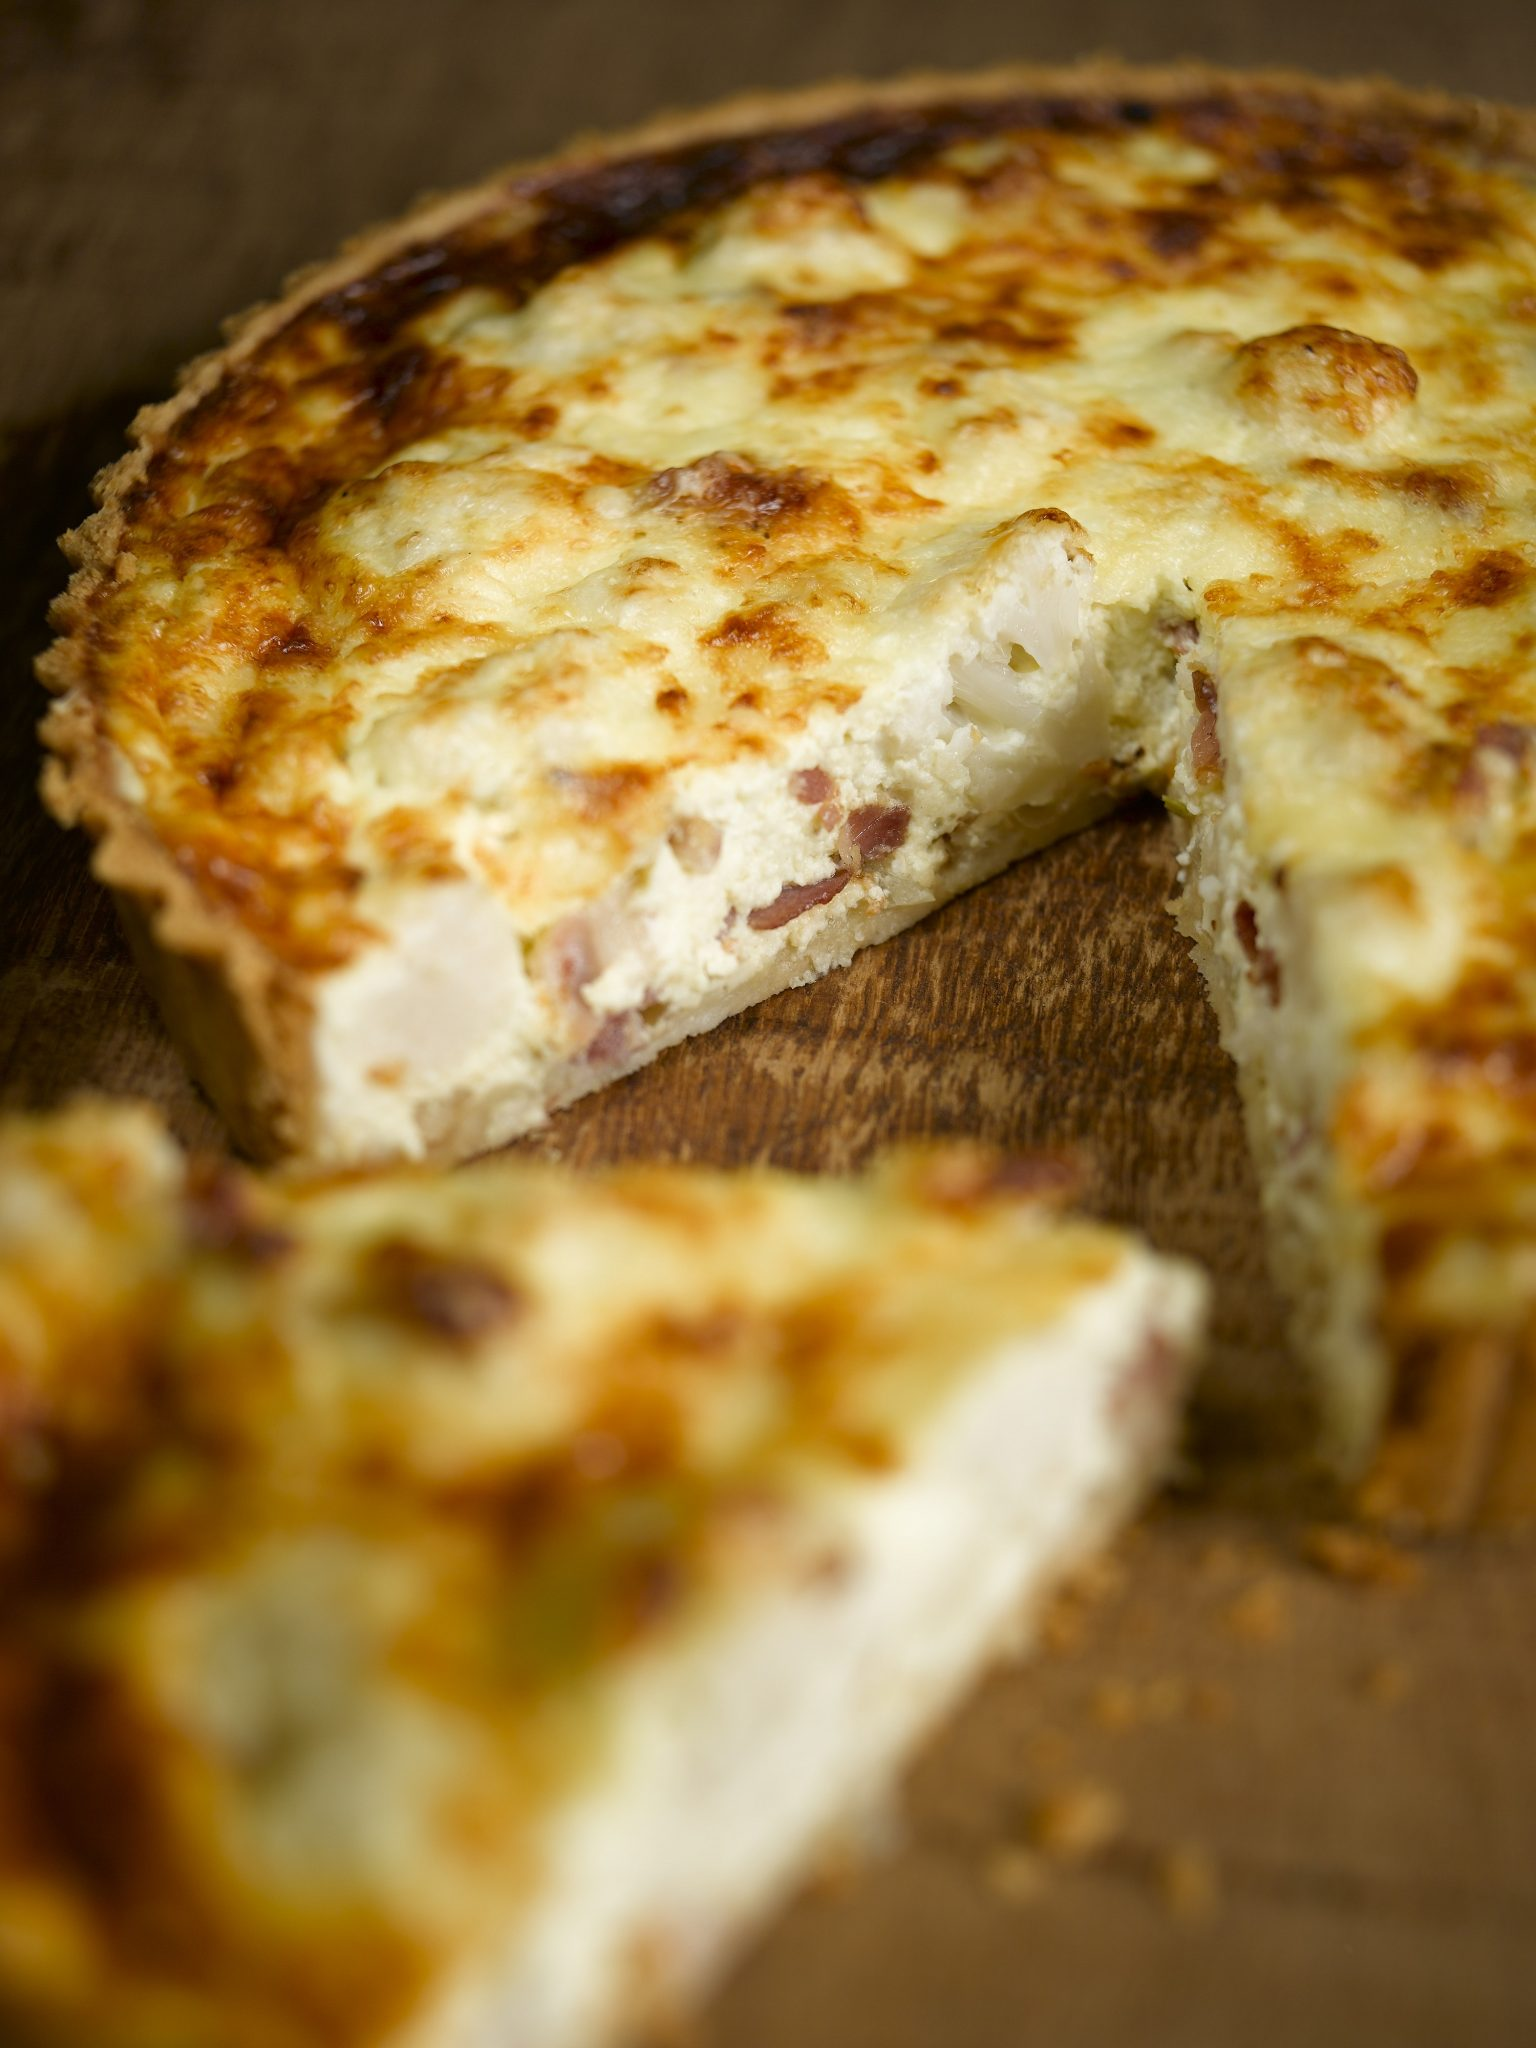 Godminster cauliflower cheese and bacon tart